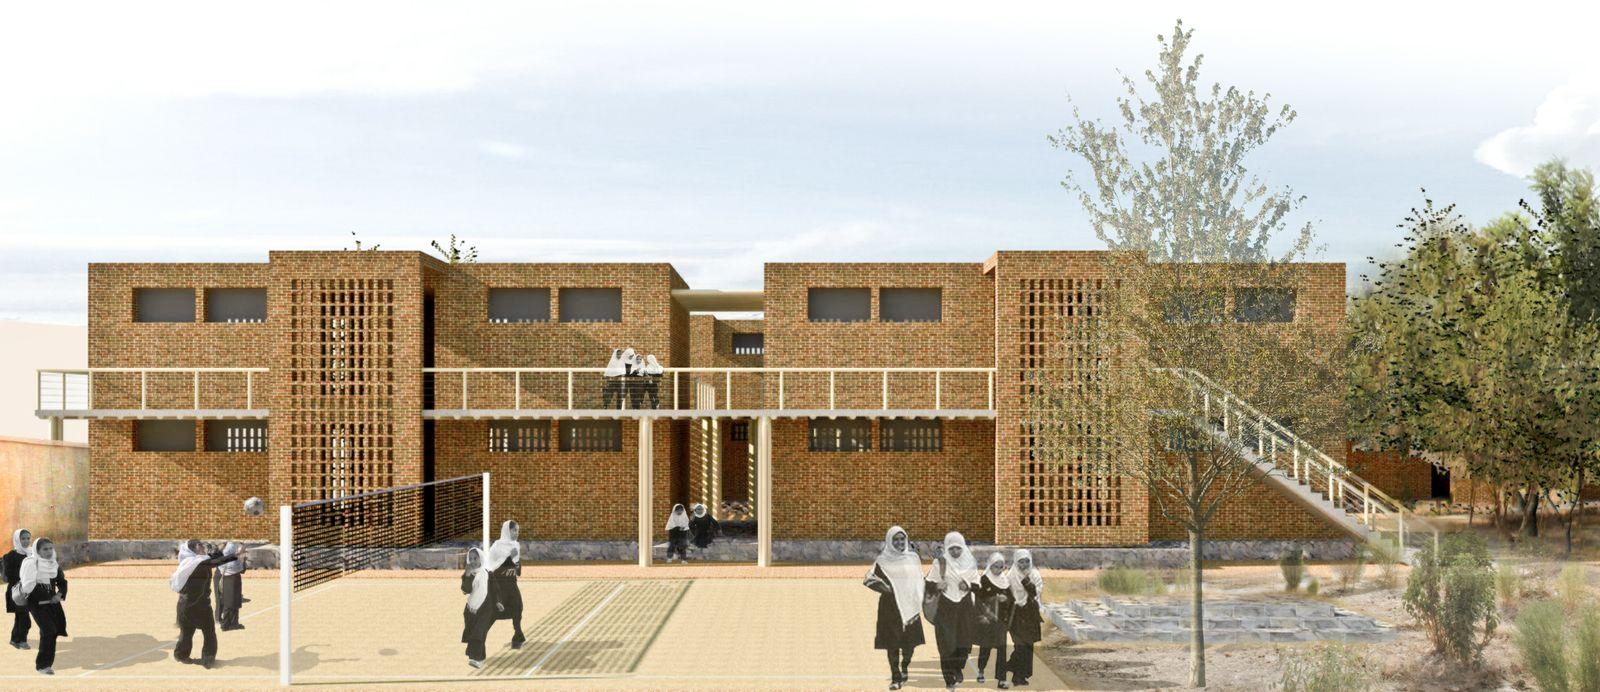 design for Afghani girls school by Yasaman Haji Esmaili and Mariam Kamara